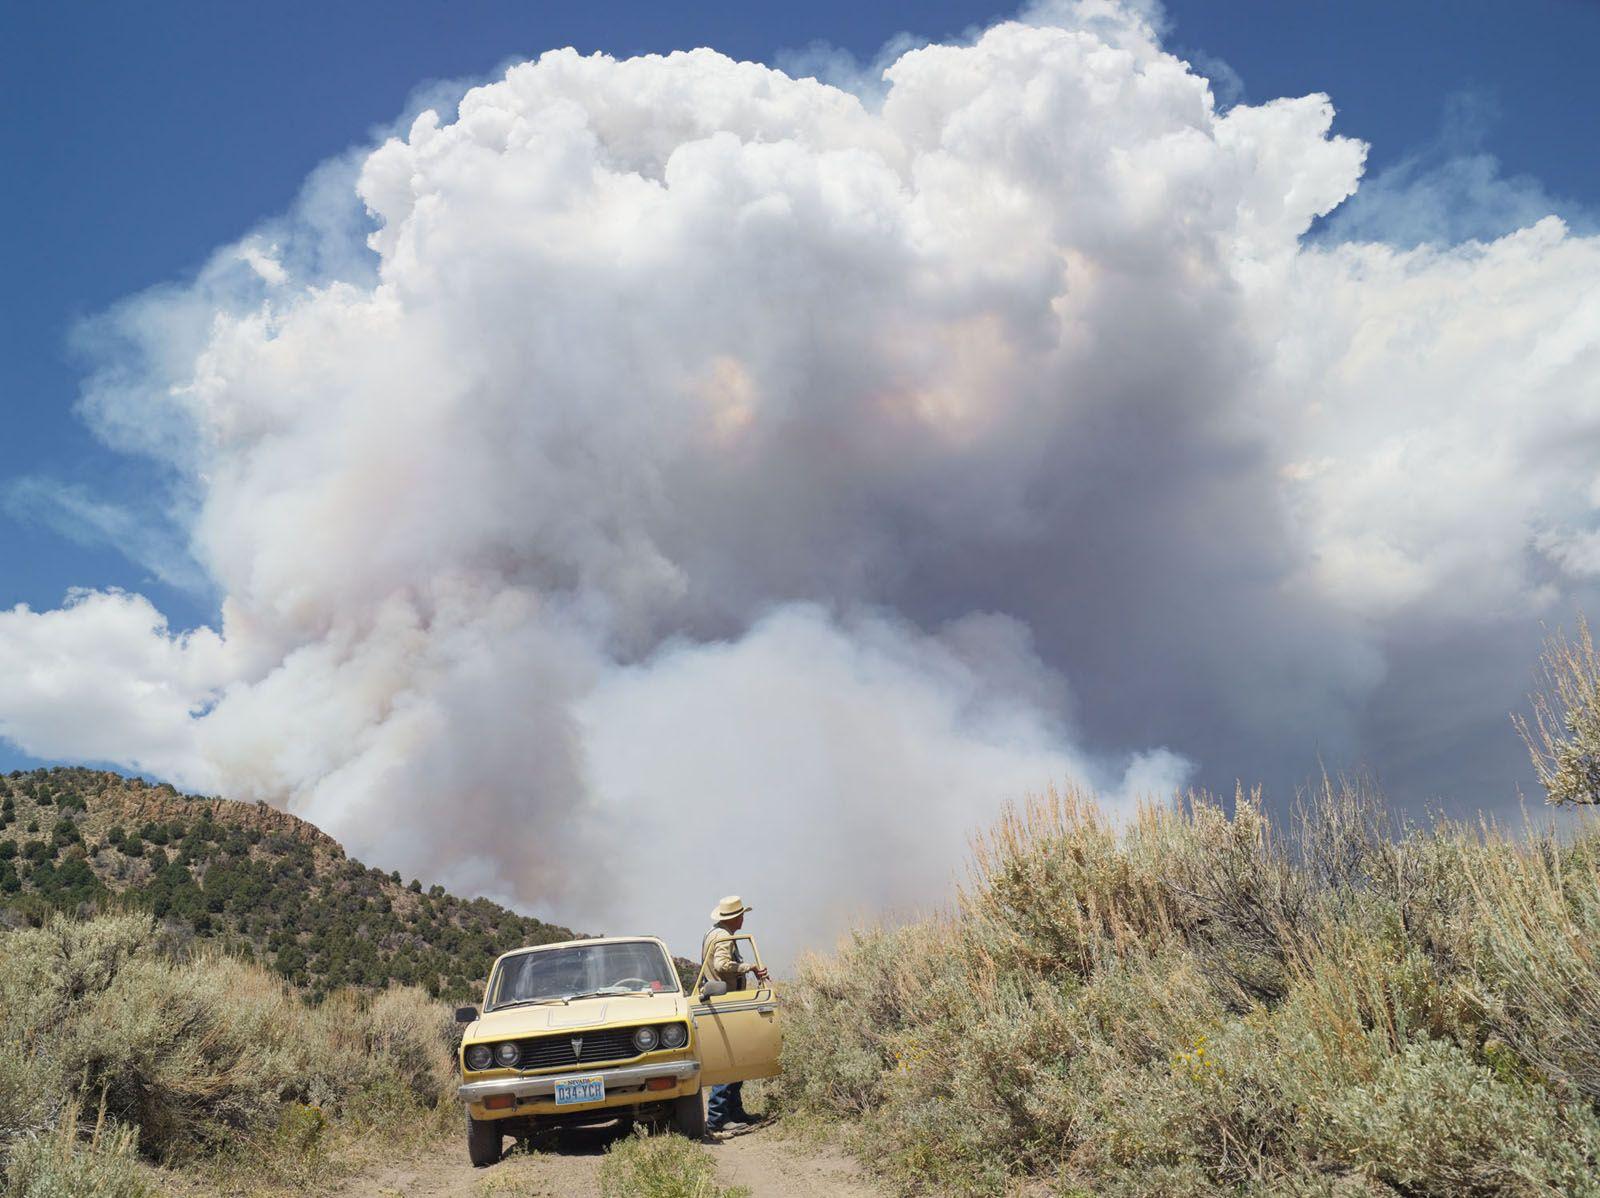 LUCAS FOGLIA, George Chasing Wildfires, Eureka, Nevada, 2012